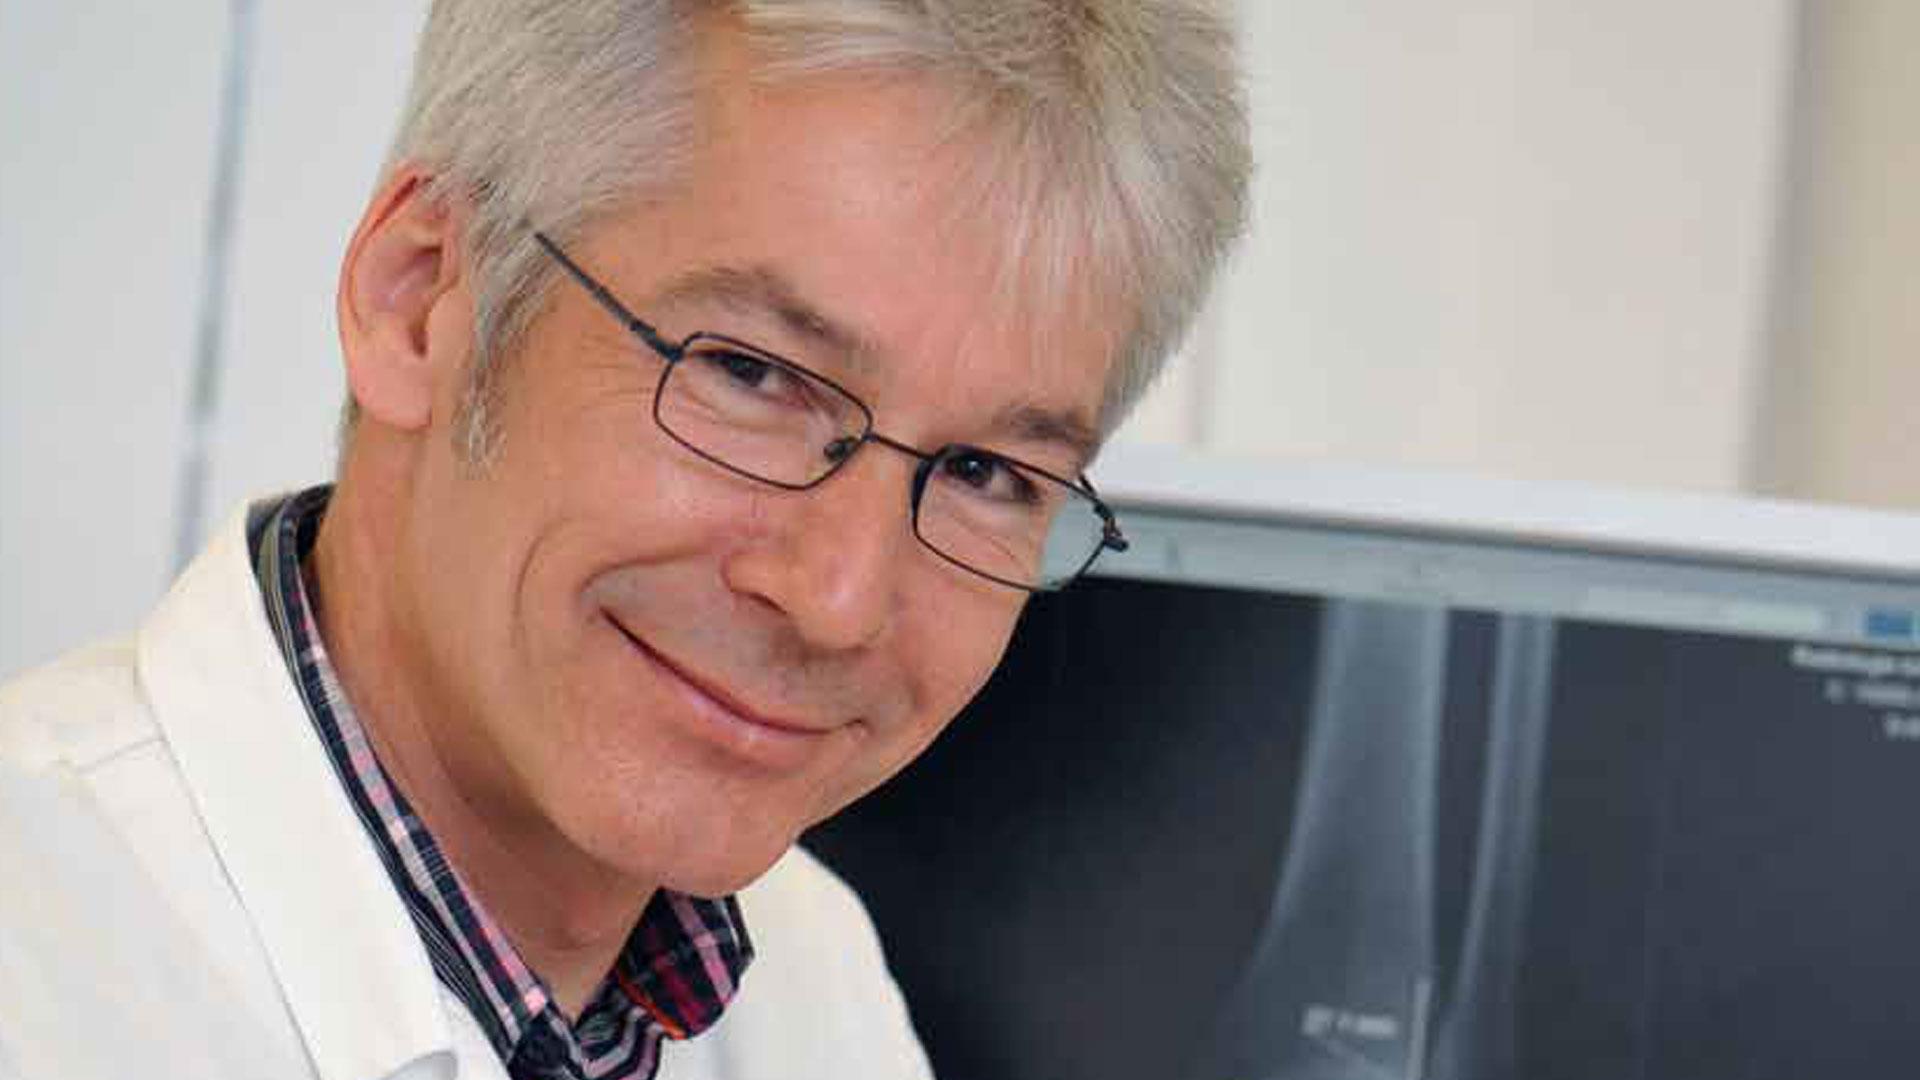 Prof. Dr. Martin Weber – Fusszentrum Neufeld